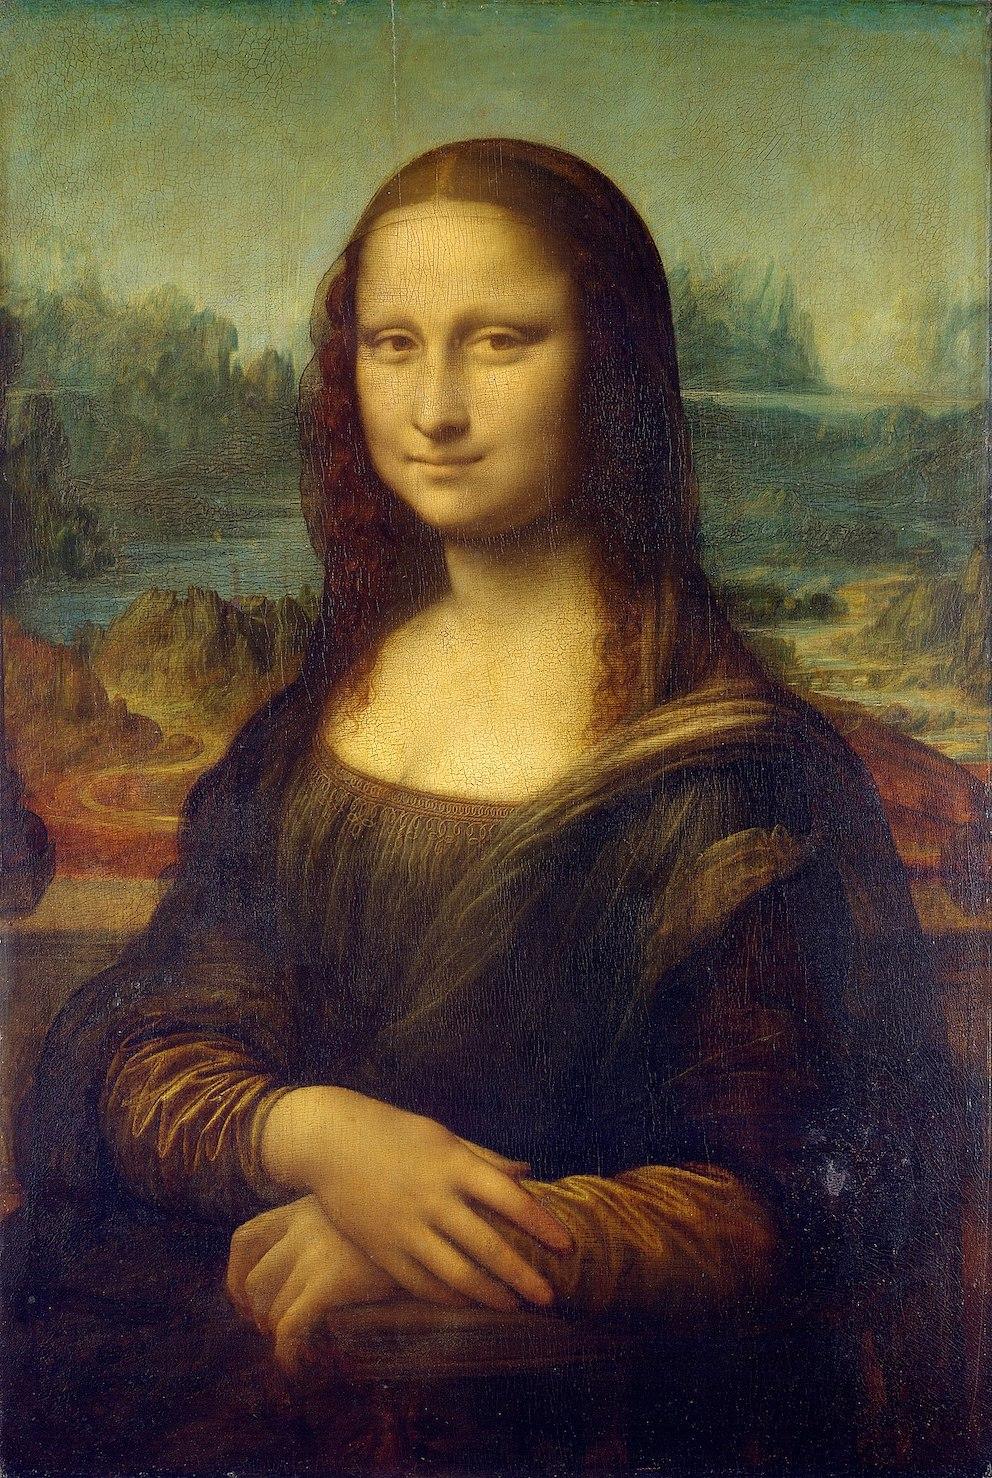 1200px-Mona_Lisa,_by_Leonardo_da_Vinci,_from_C2RMF_retouched